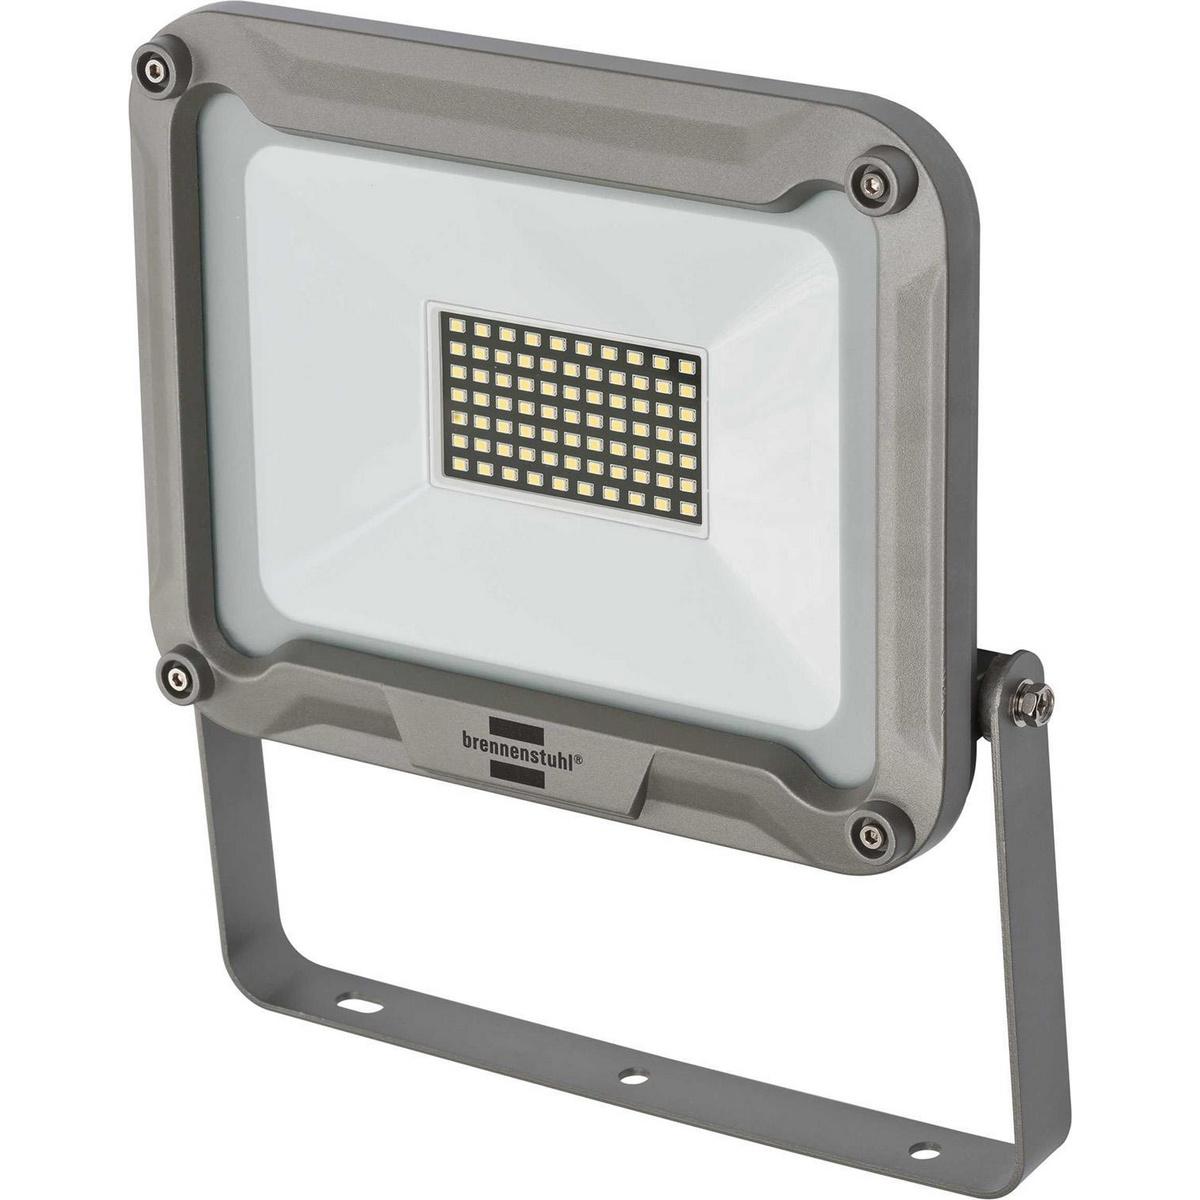 Holofote LED 50 W 4770 lm prateado